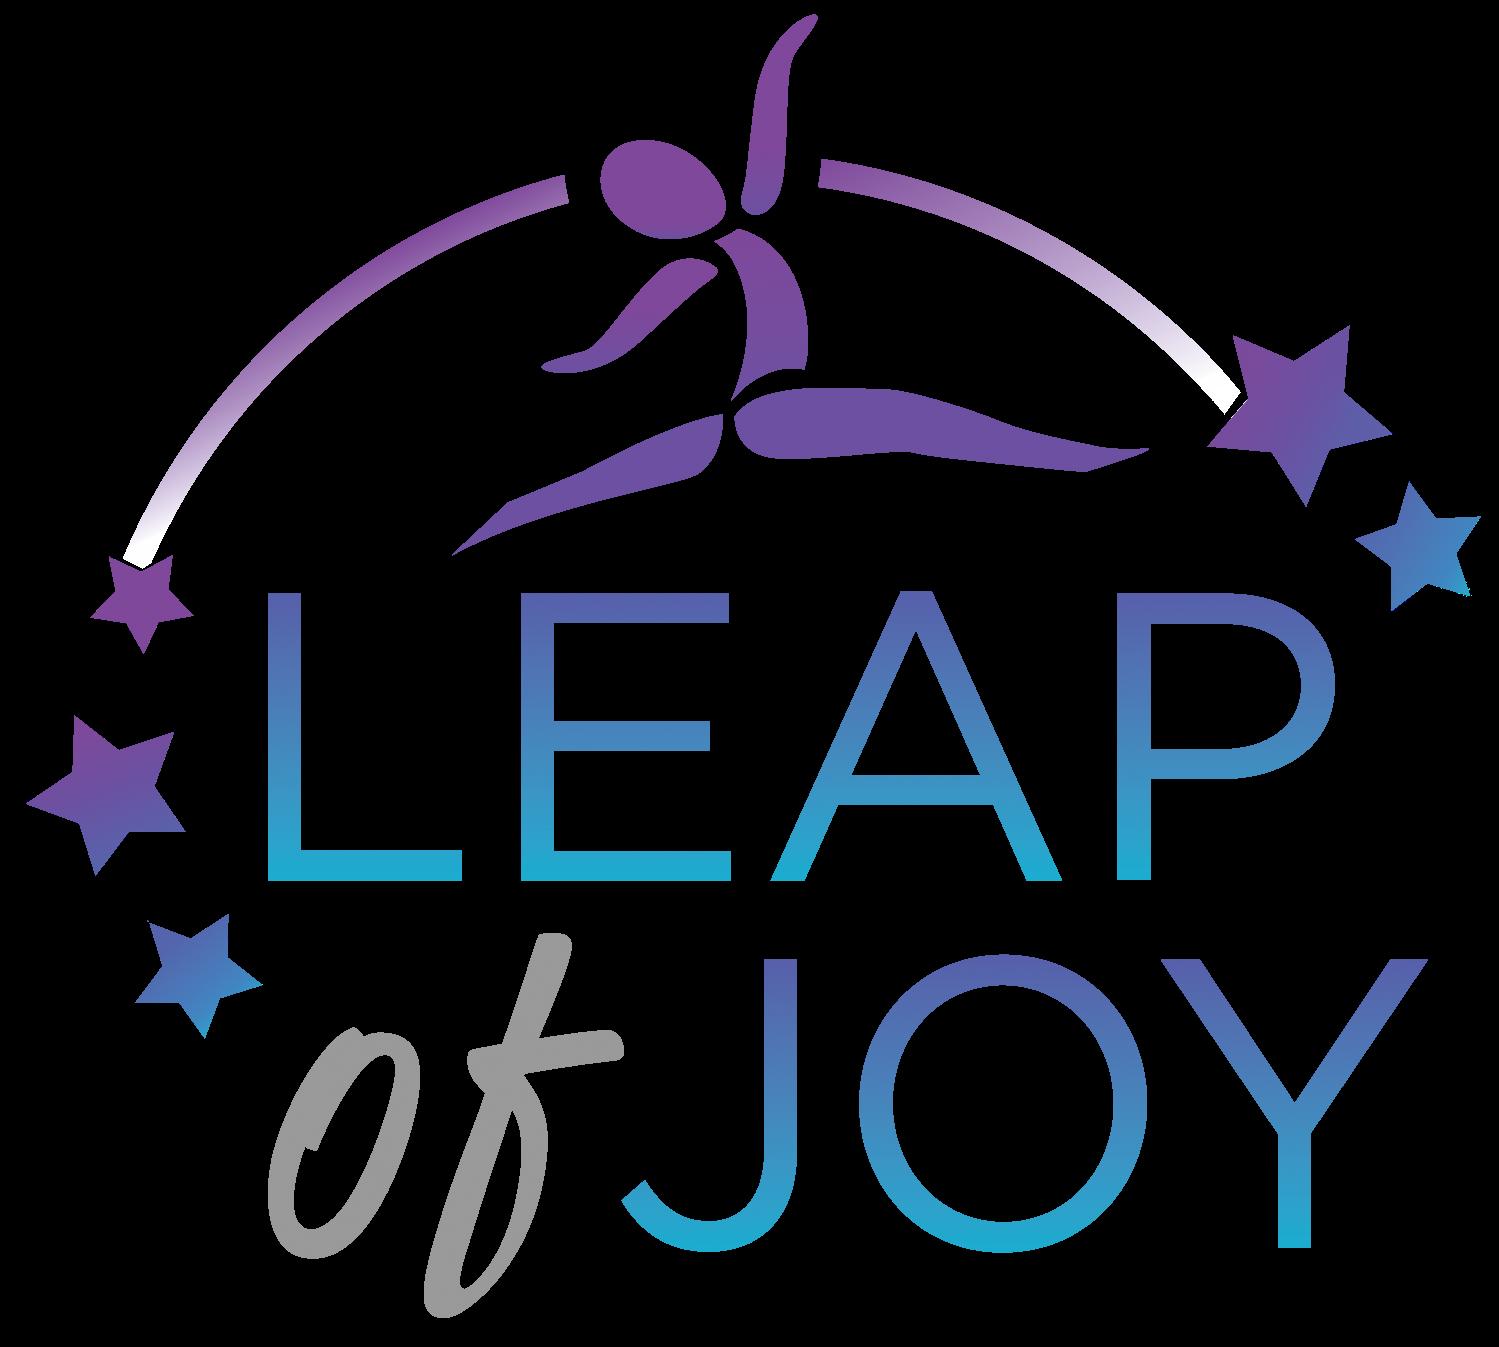 Joy healthy lifestyle